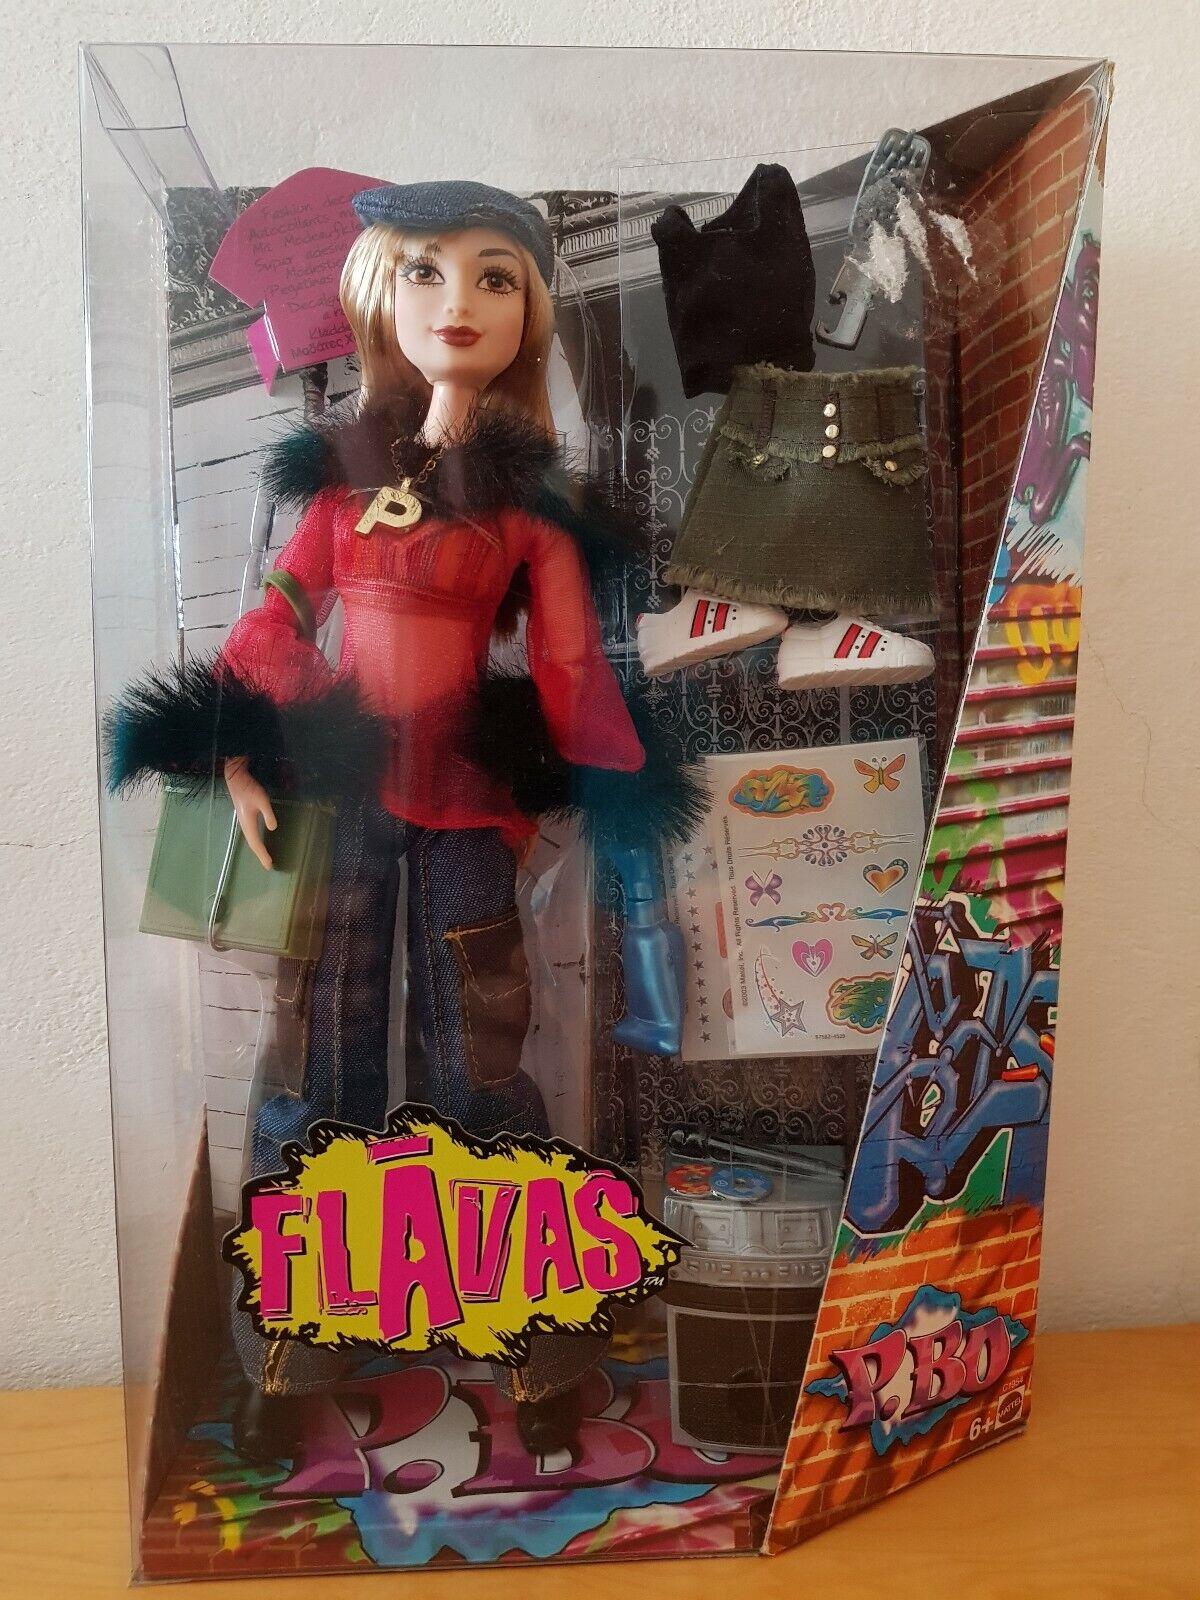 Flavas P. Bo - Barbie - Mattel 2003 - NEU NEU NEU - NRFB - selten 201966